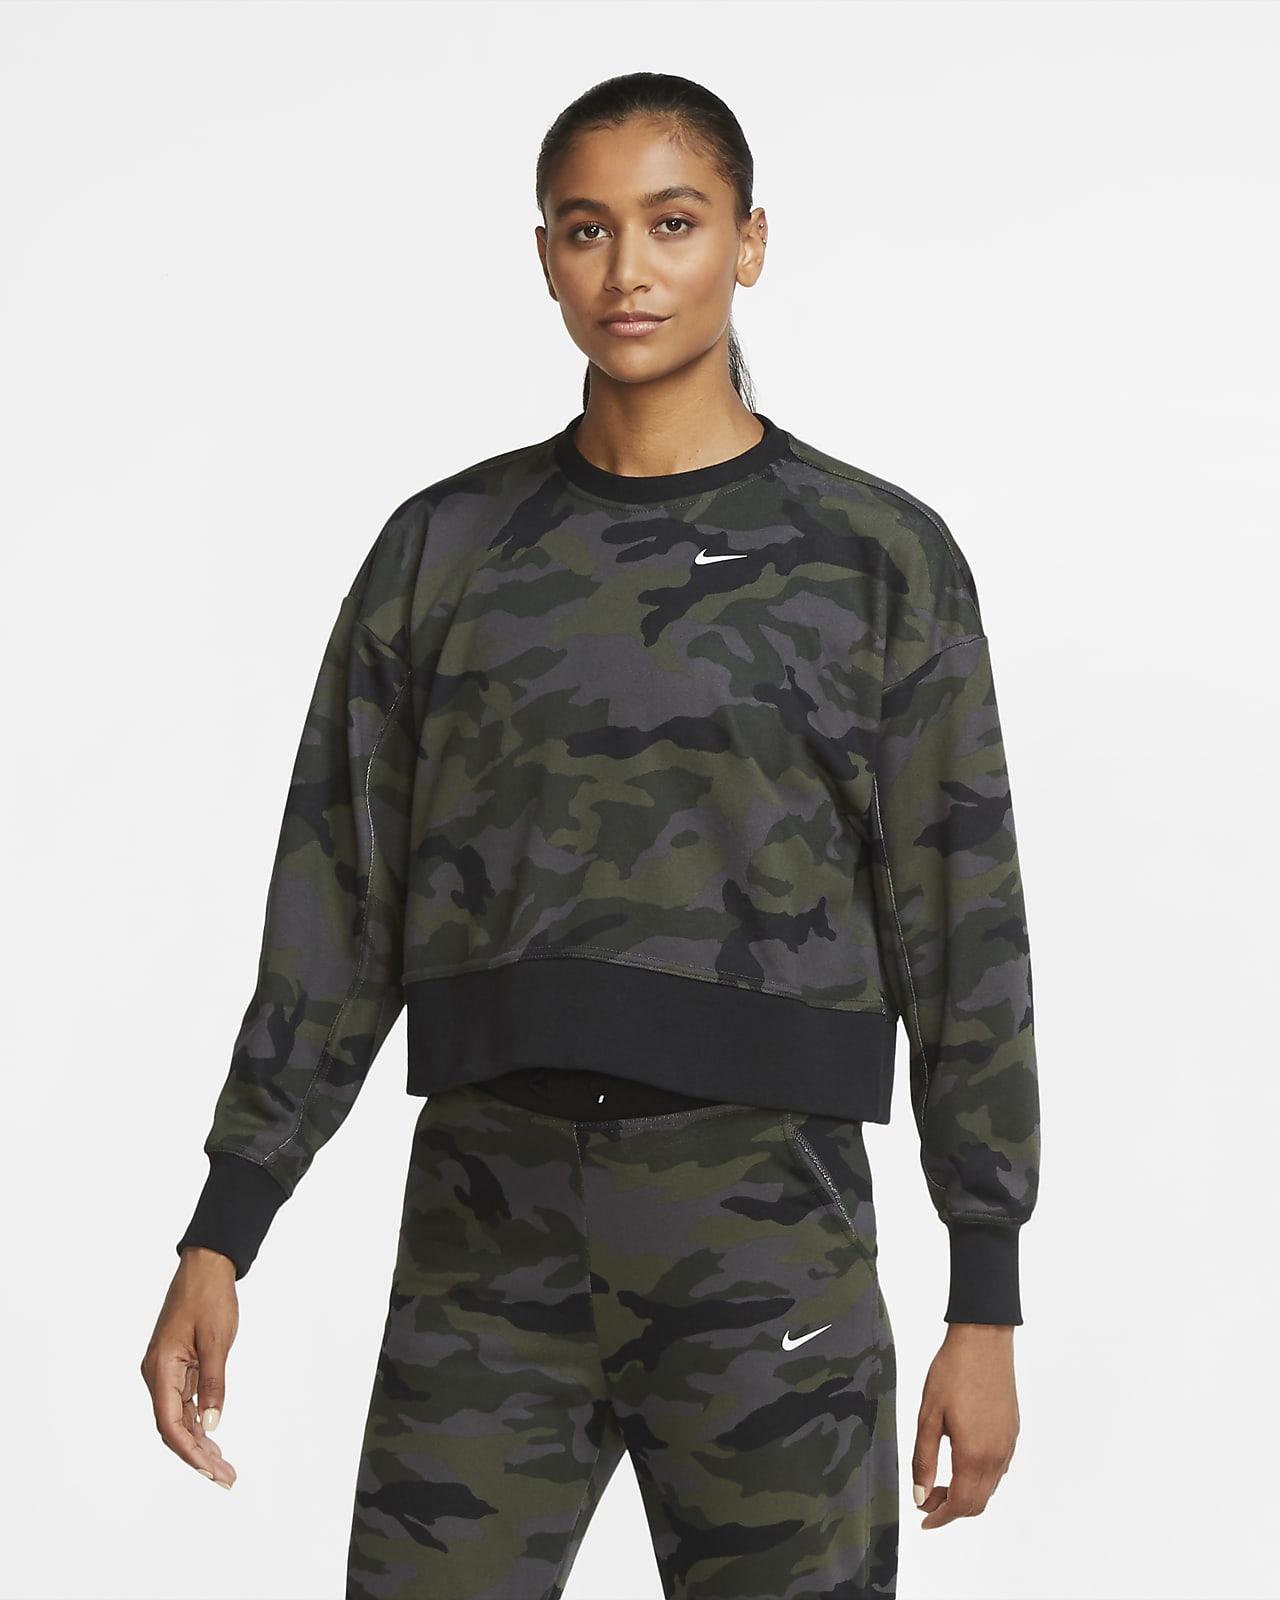 Nike Dri-FIT Get Fit Trainingsshirt met ronde hals en camouflageprint voor dames